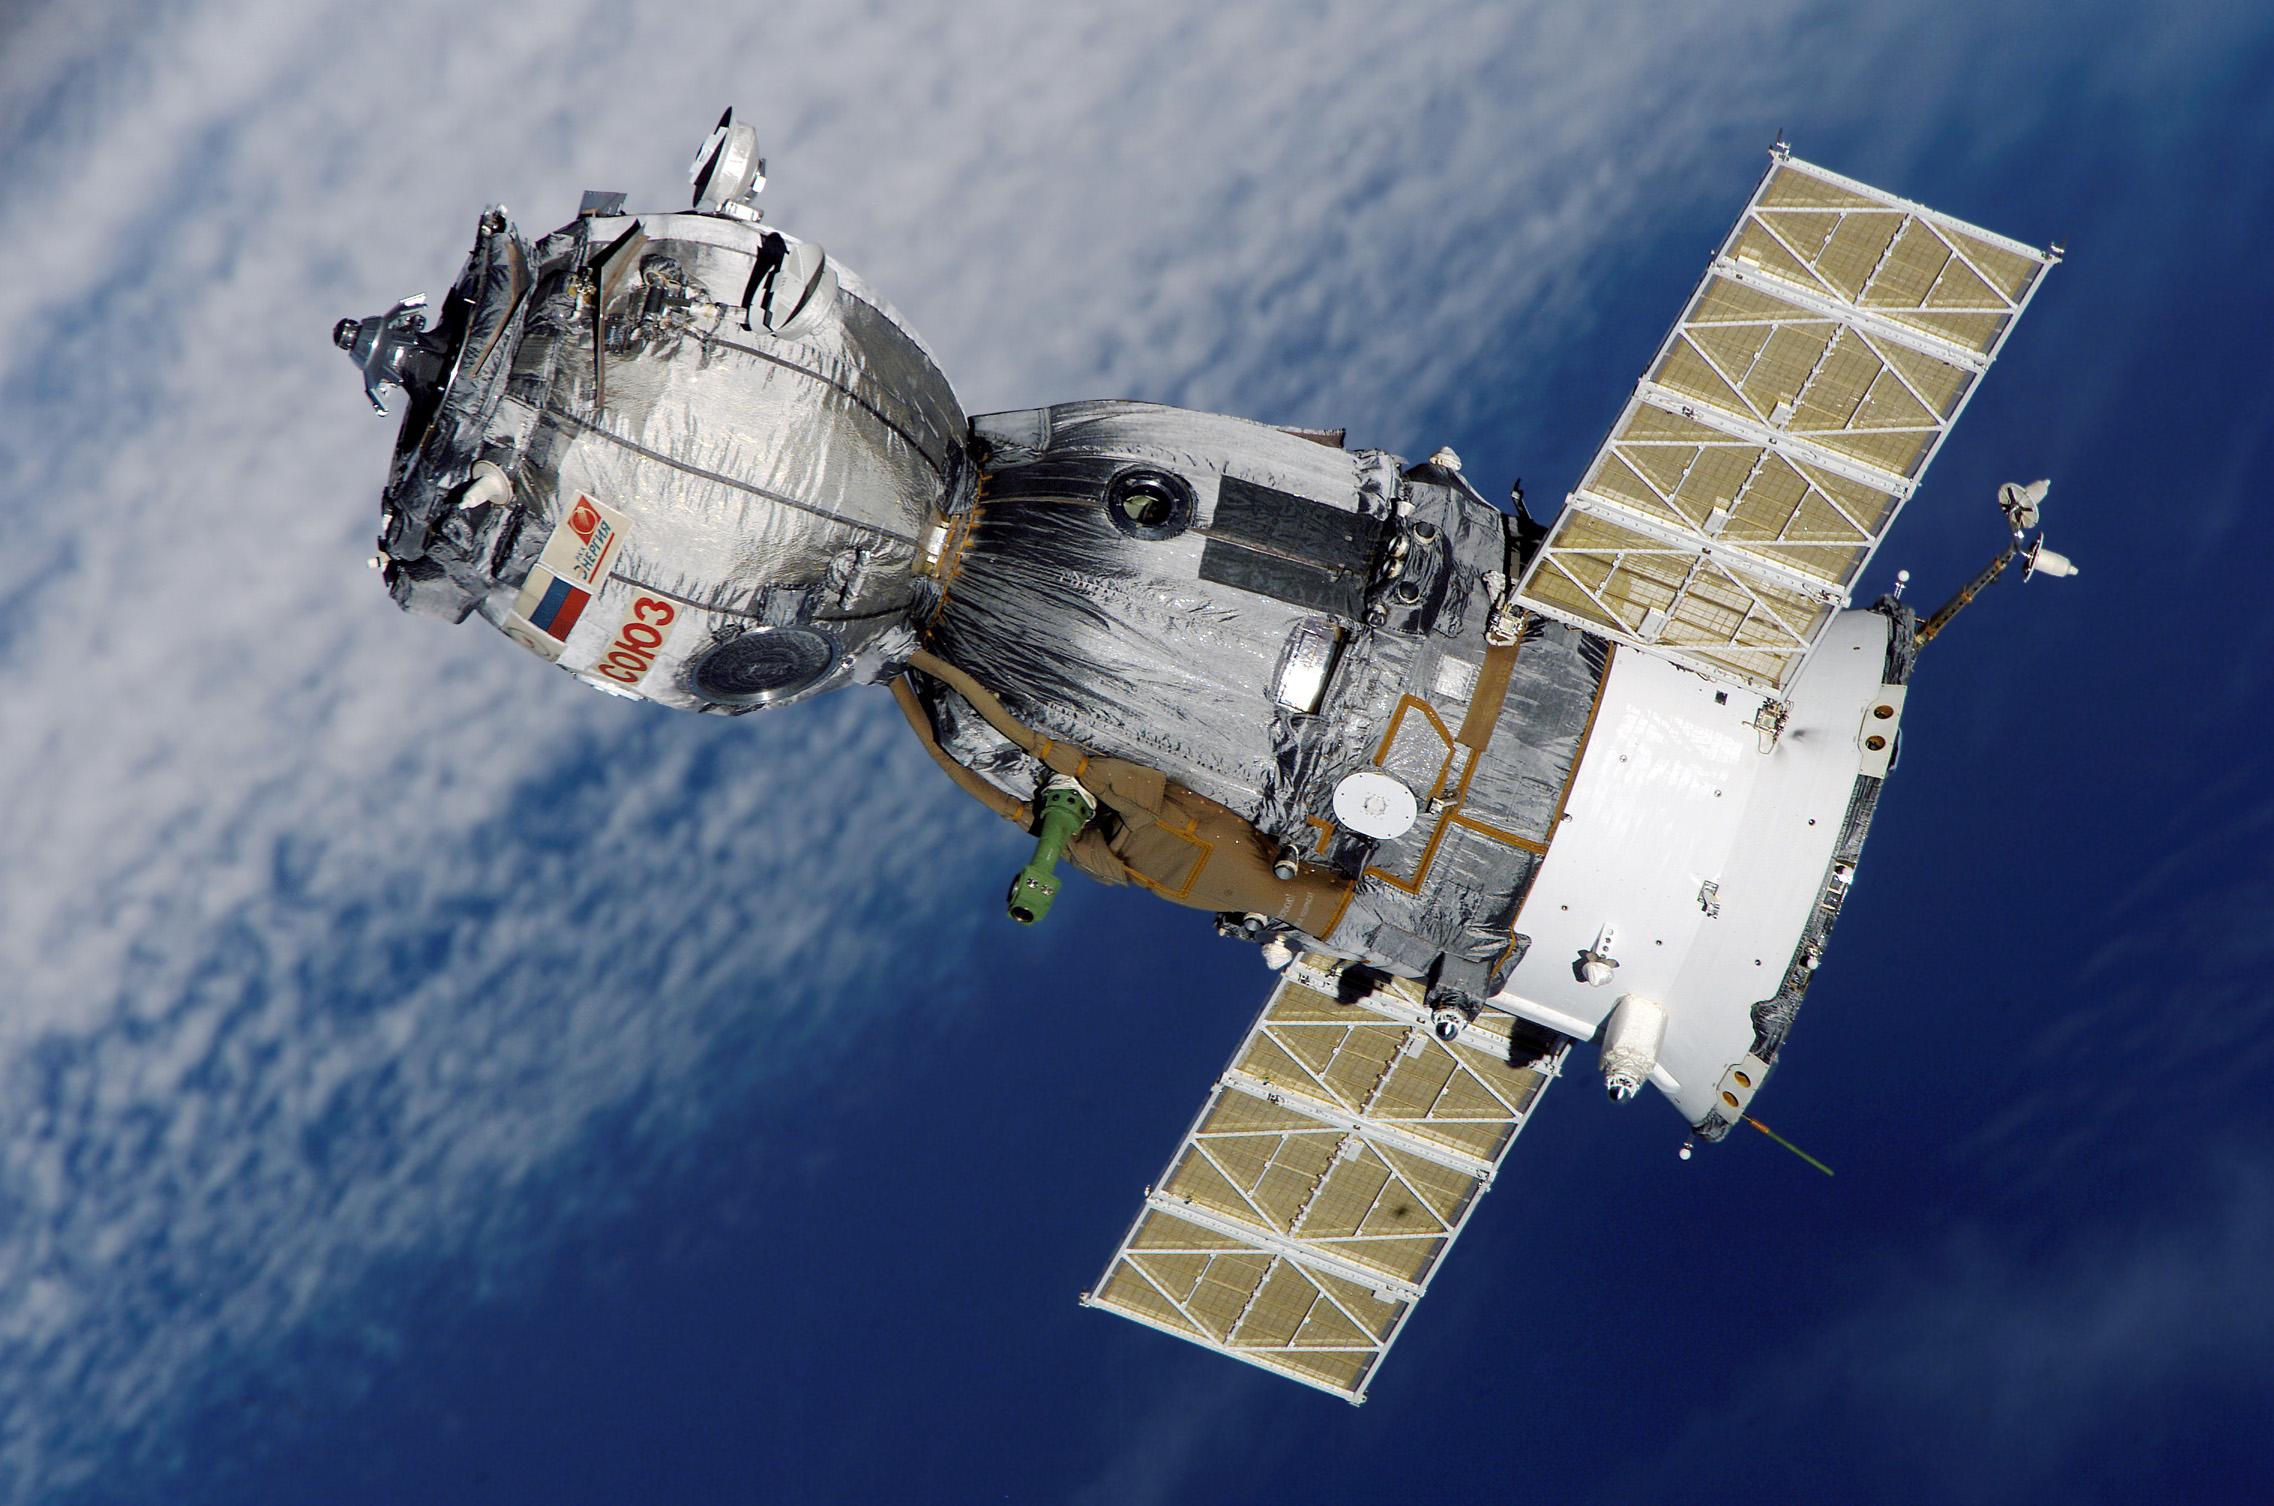 Soyuz_TMA-7_spacecraft2edit1